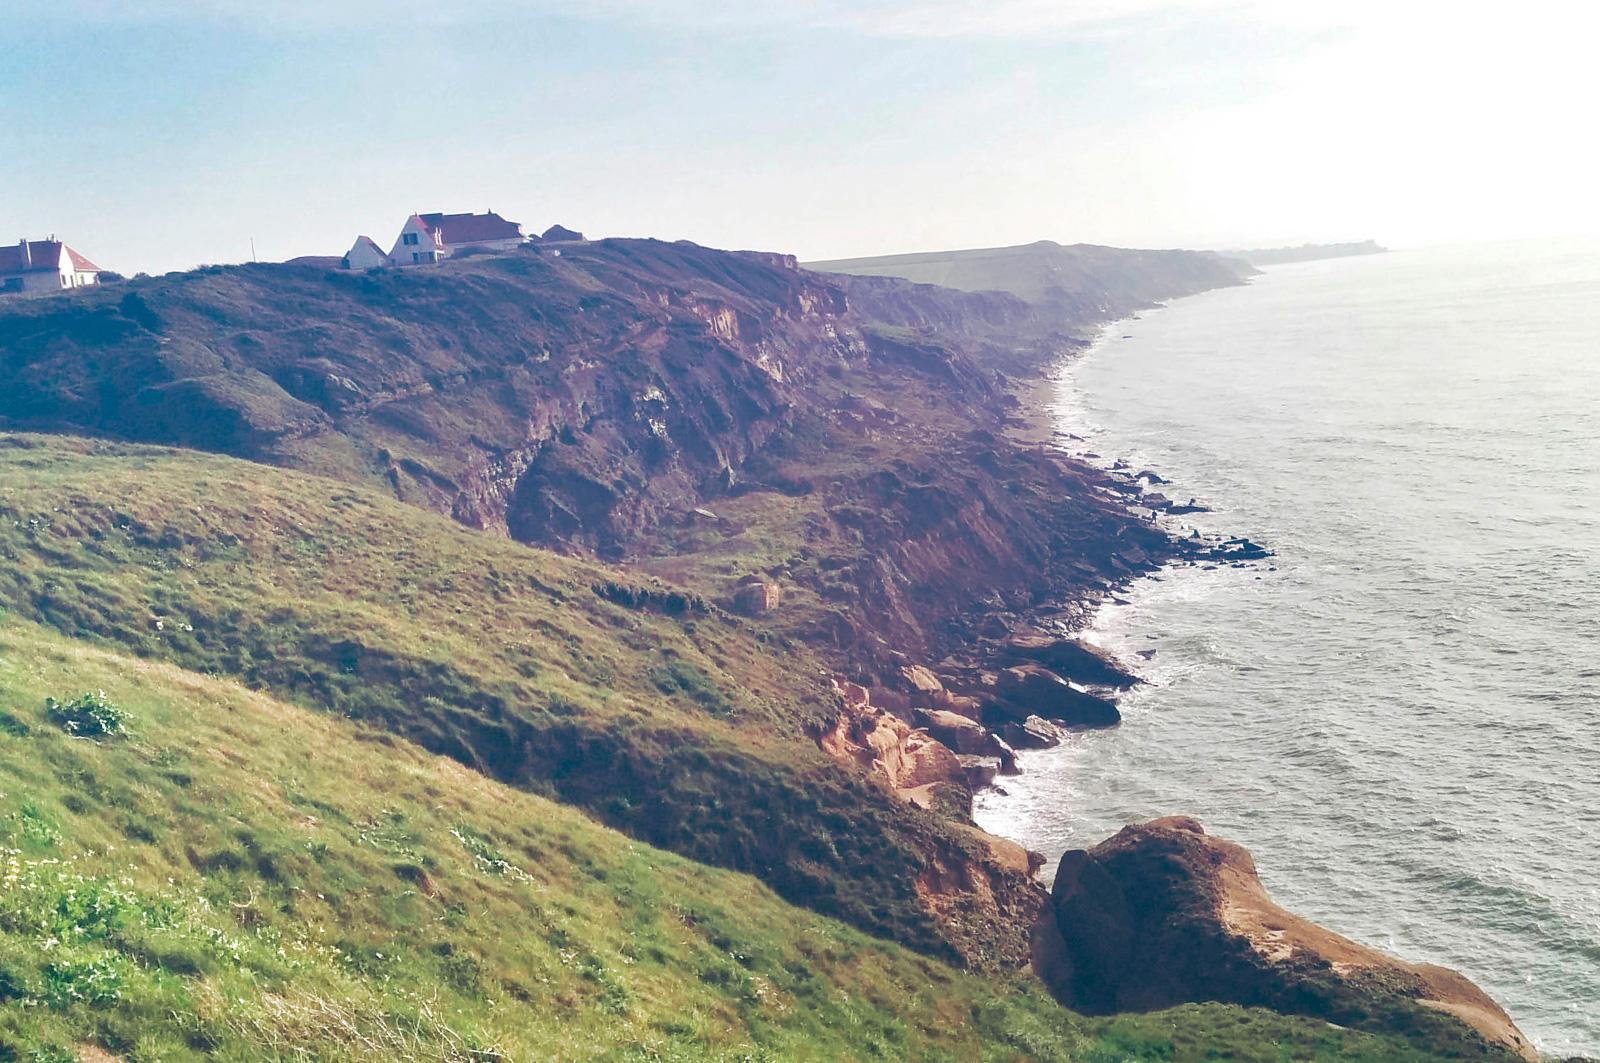 Balades côte d'Opale Norauto